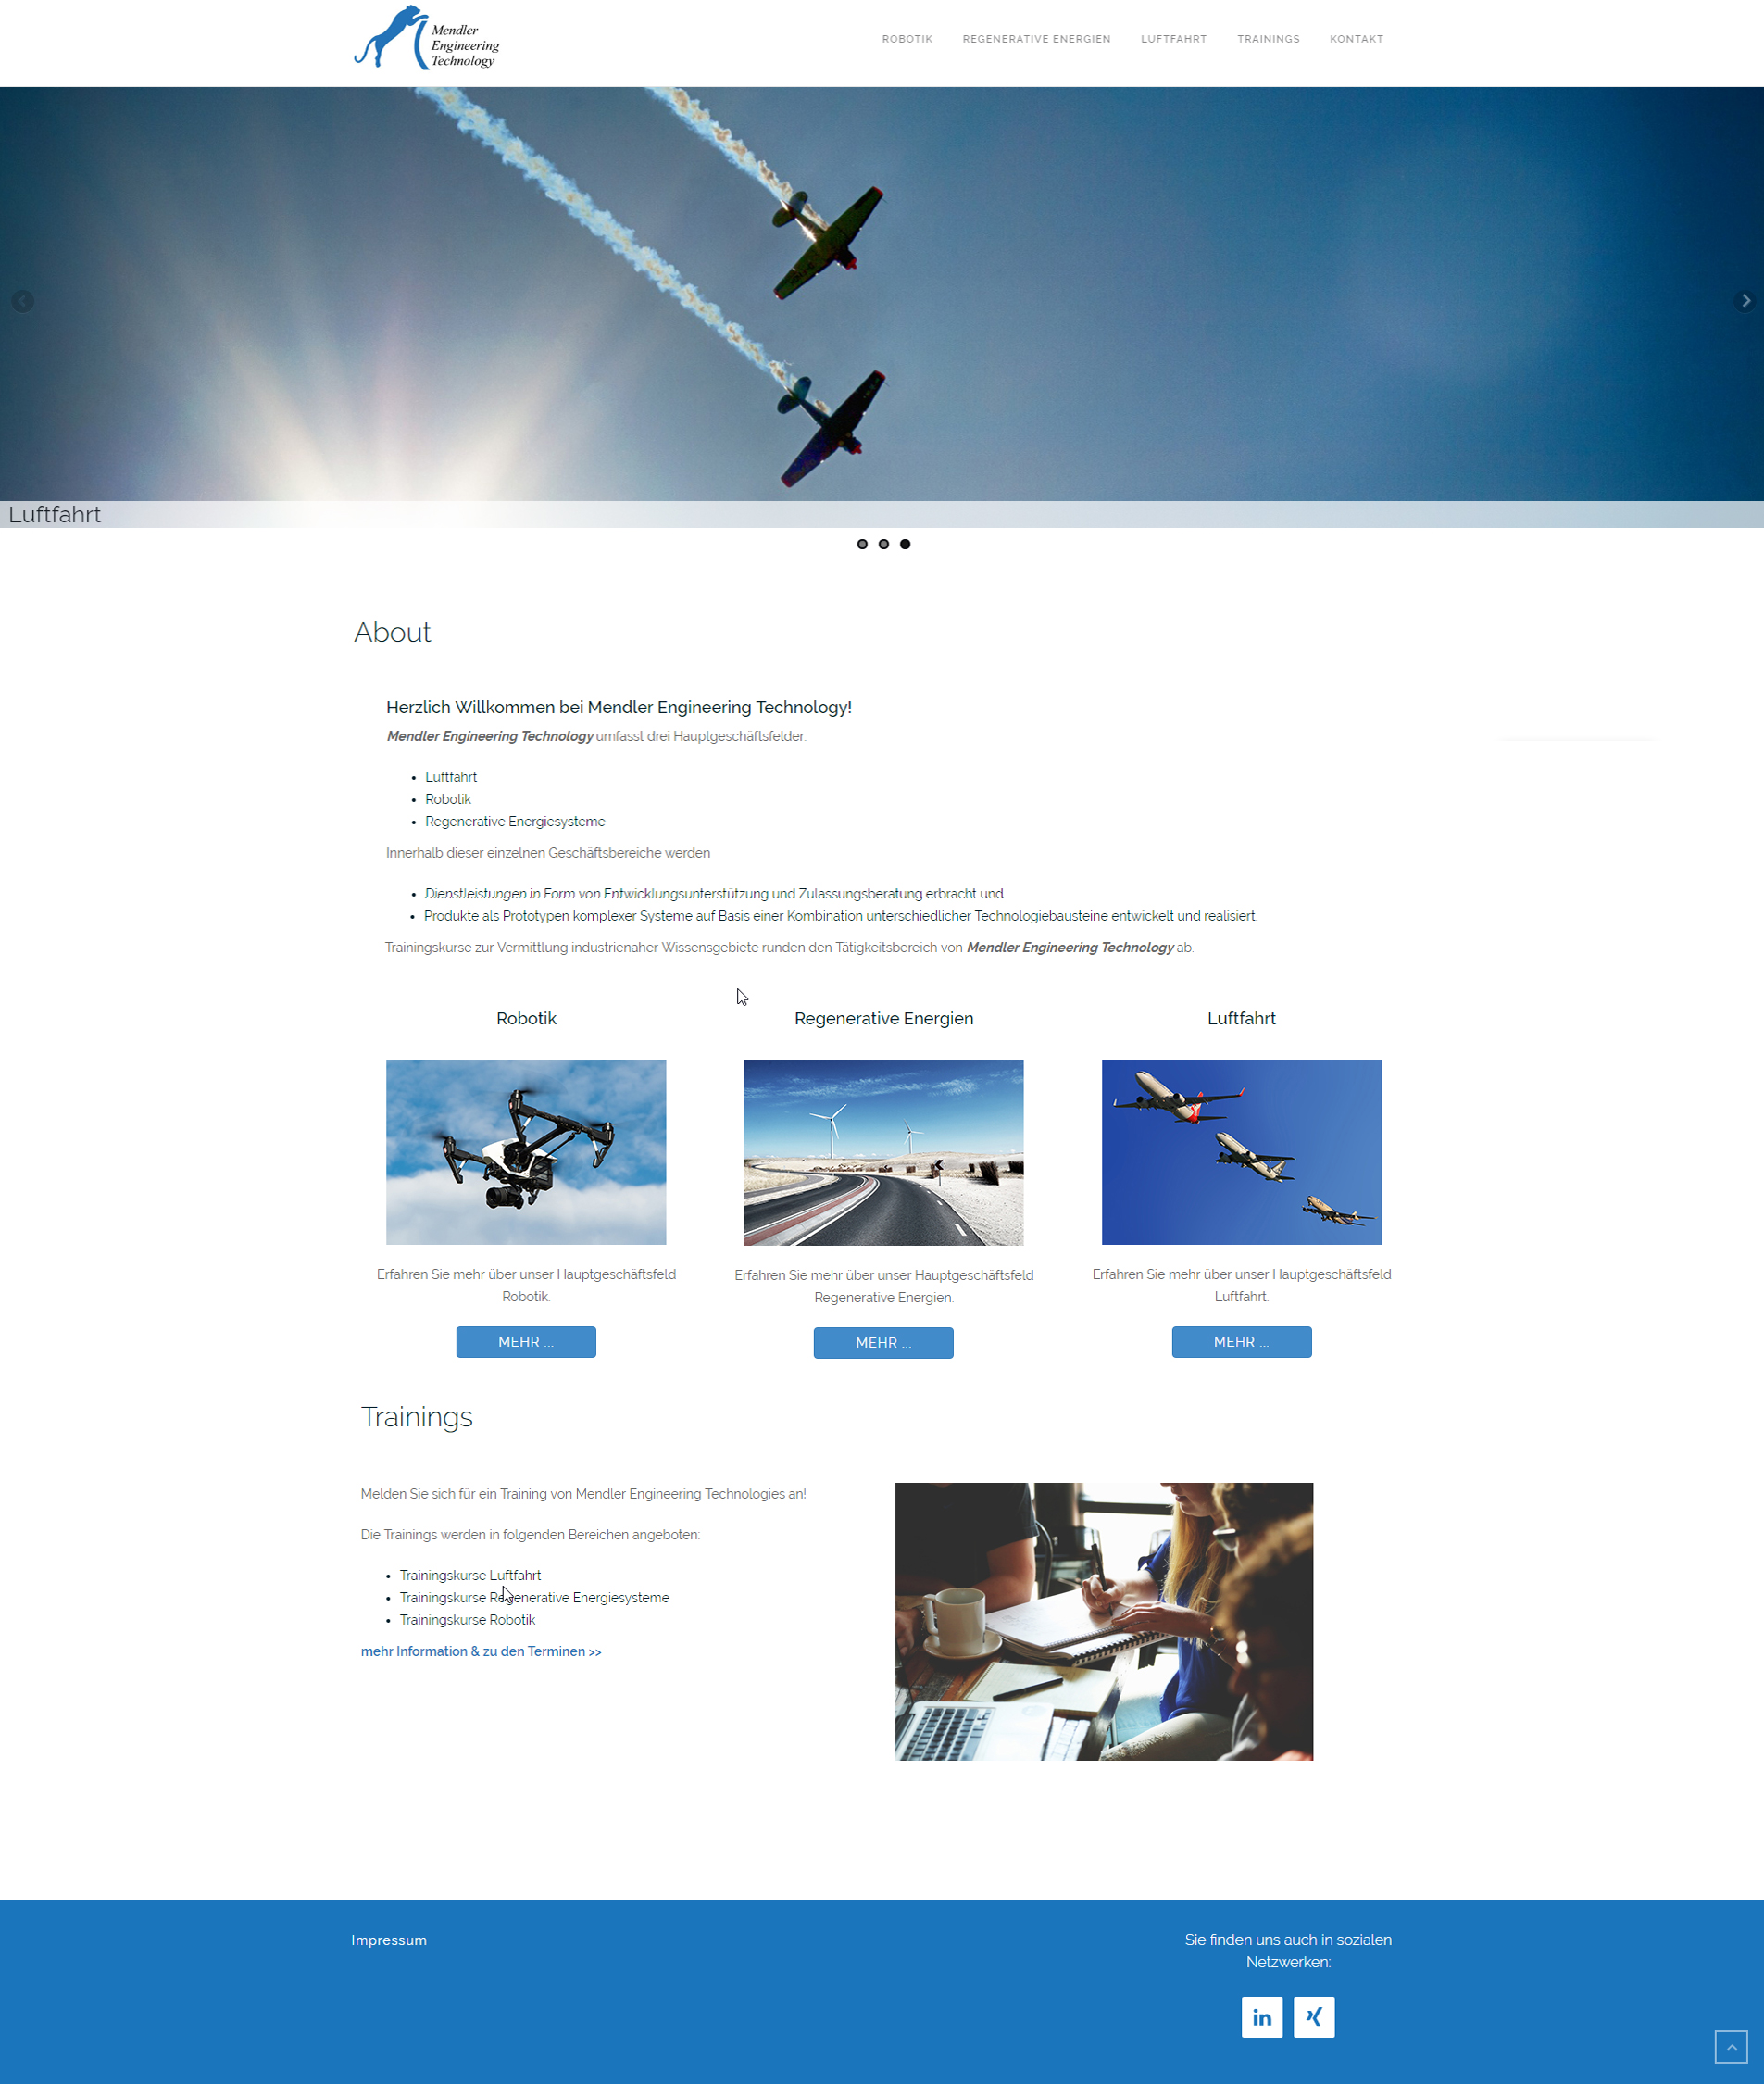 mendler-engineering-technology-website